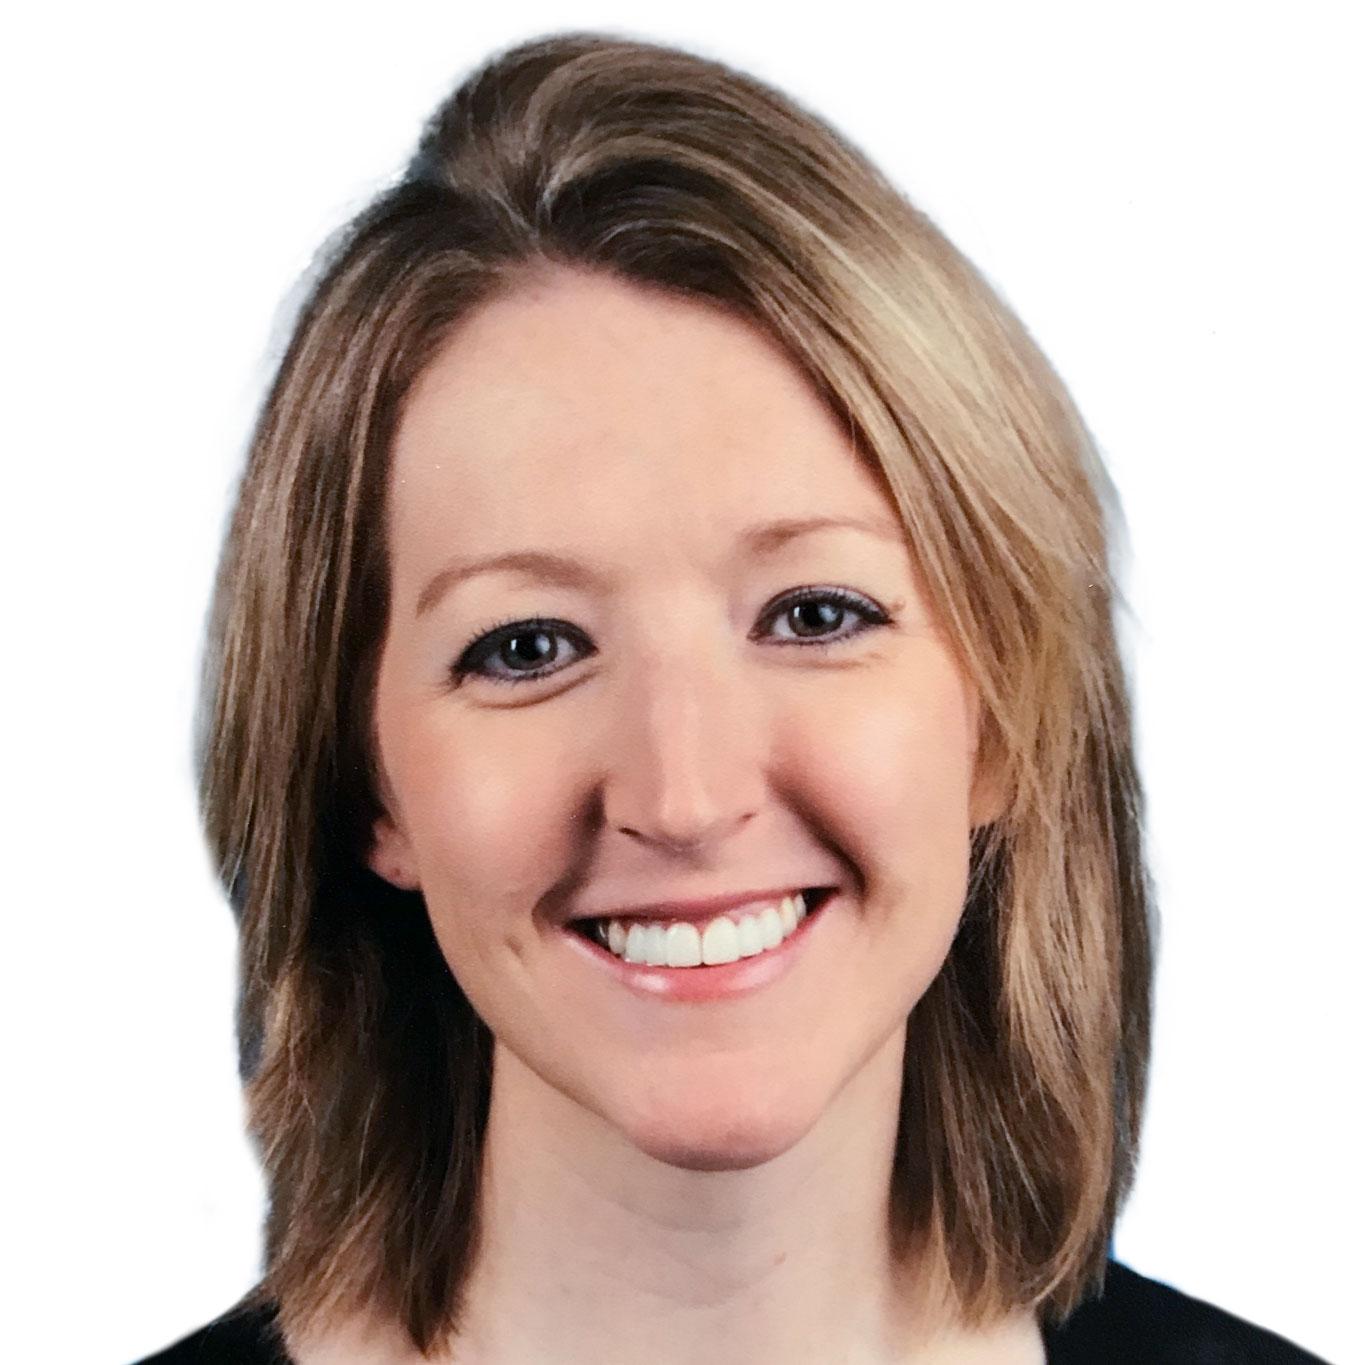 Natalie Vanderbeck